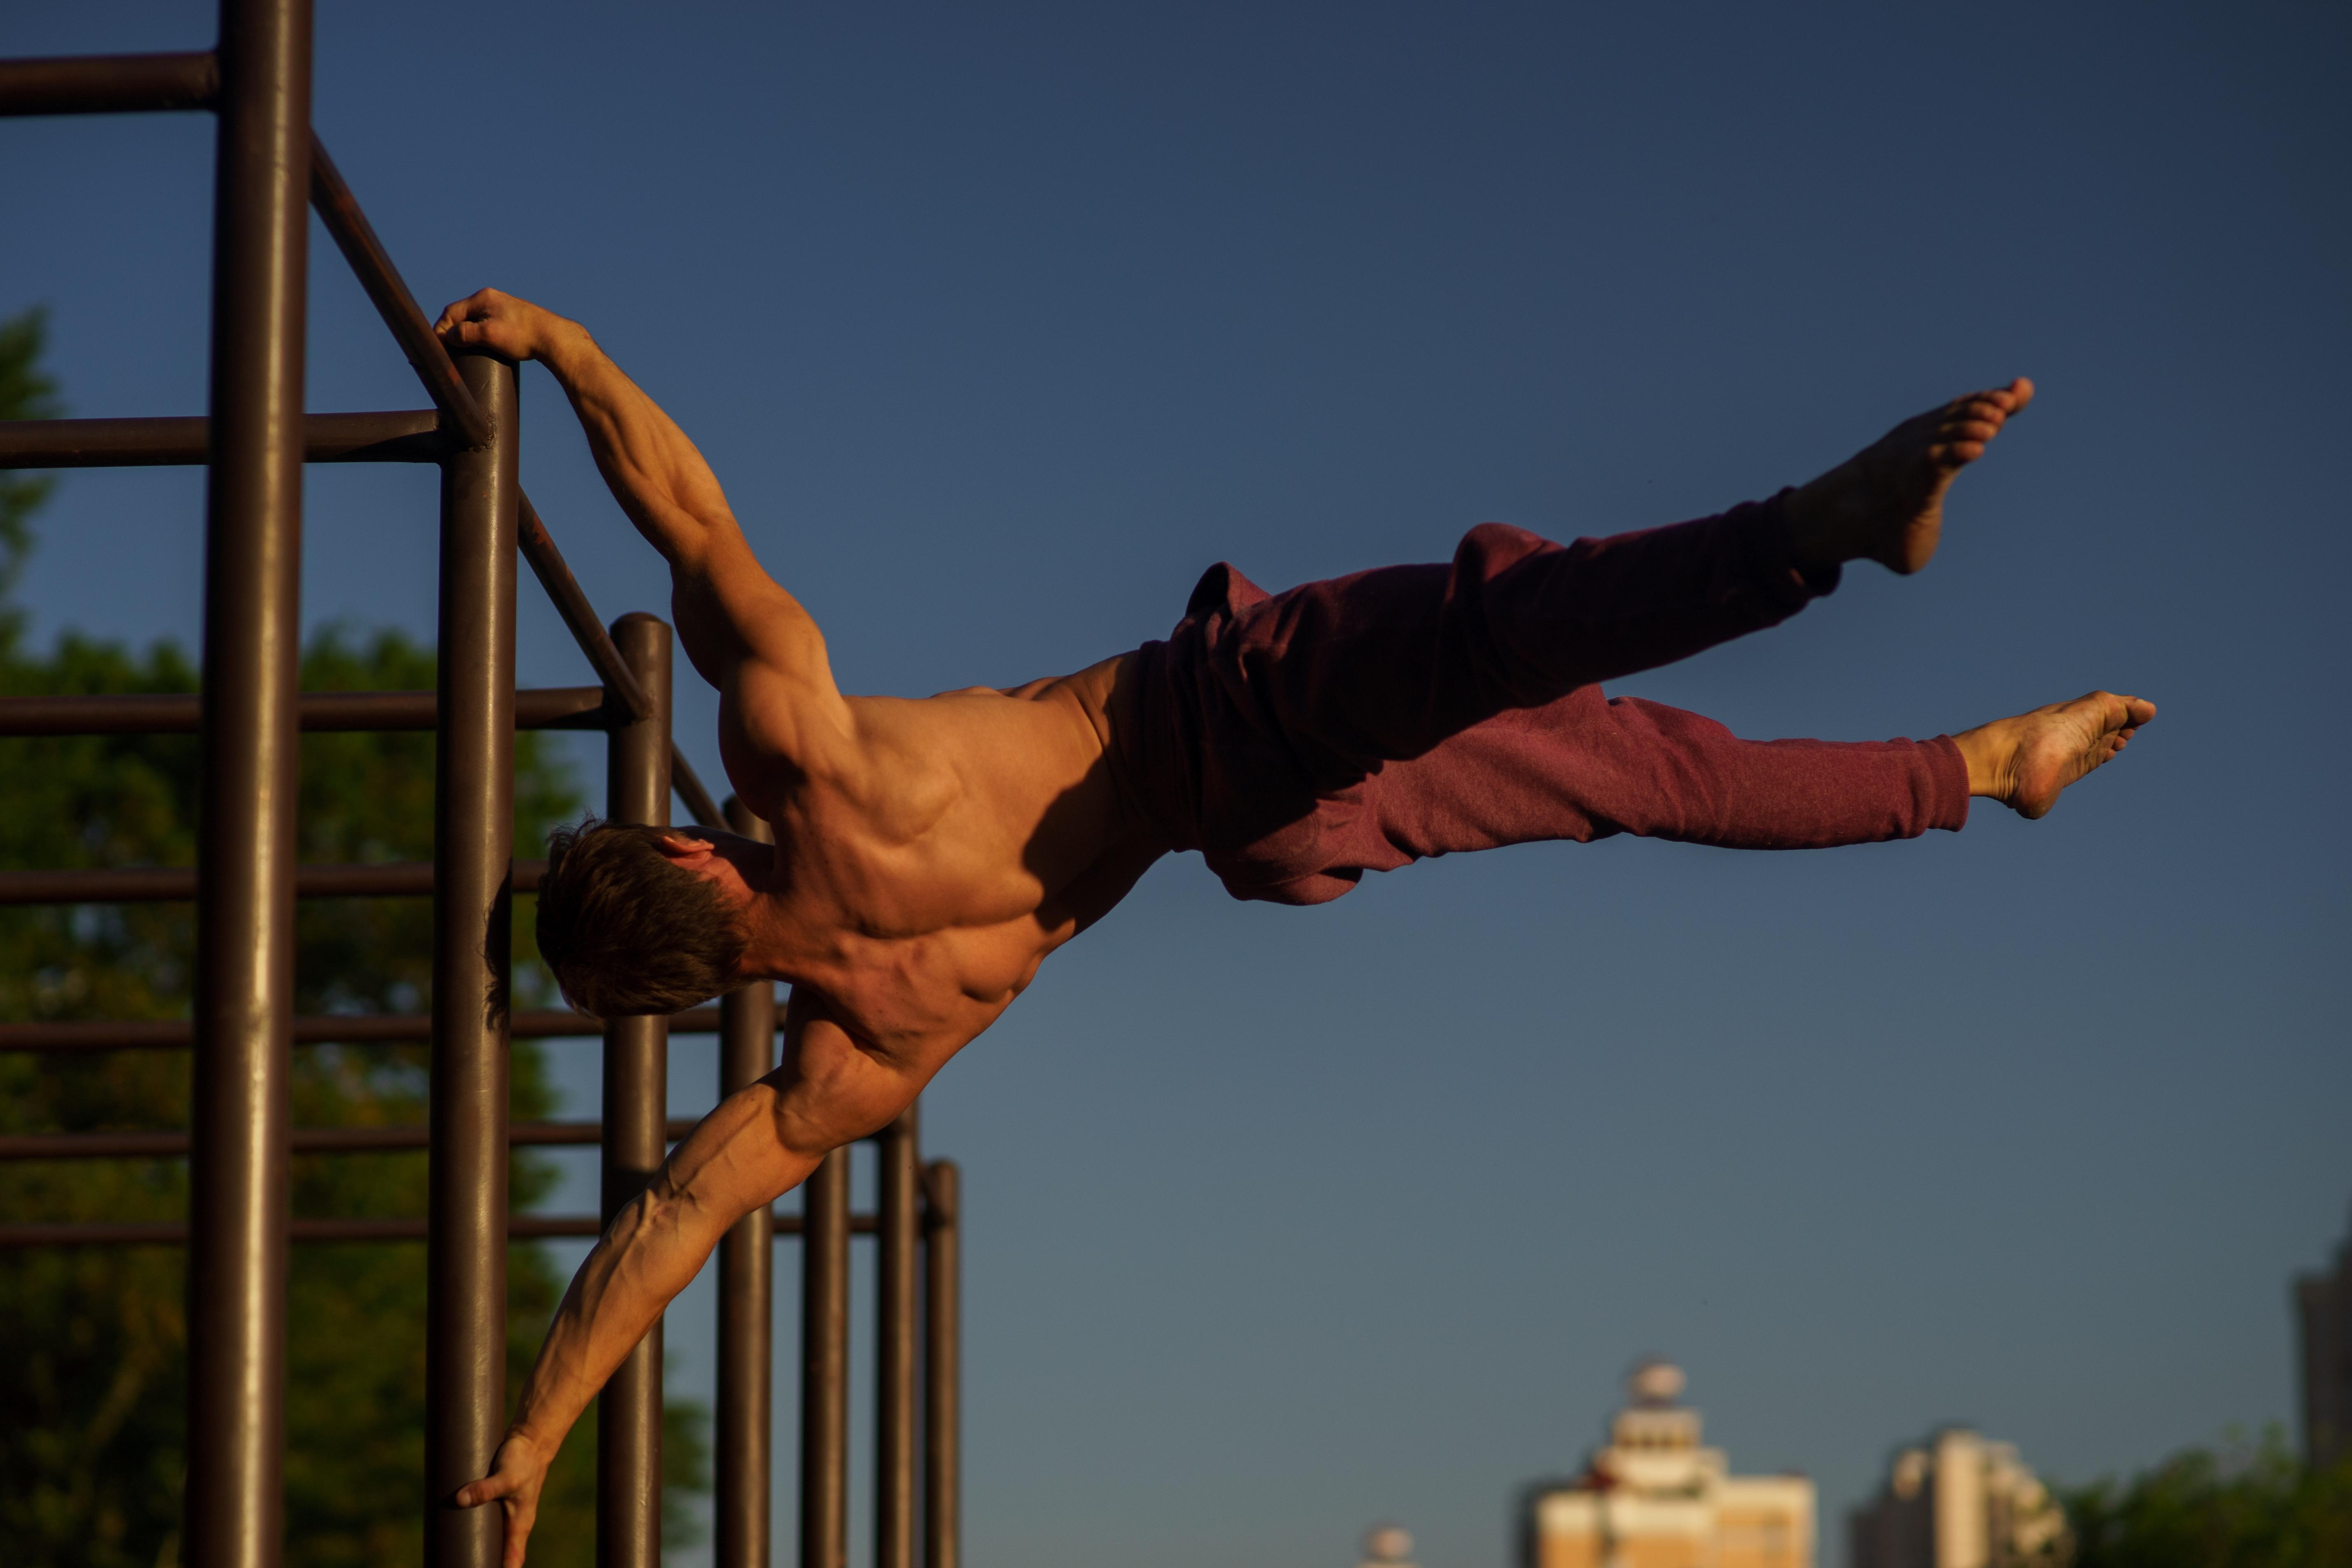 Mann beim Calisthenics Training am Gerüst | Dein Personal Trainer Berlin